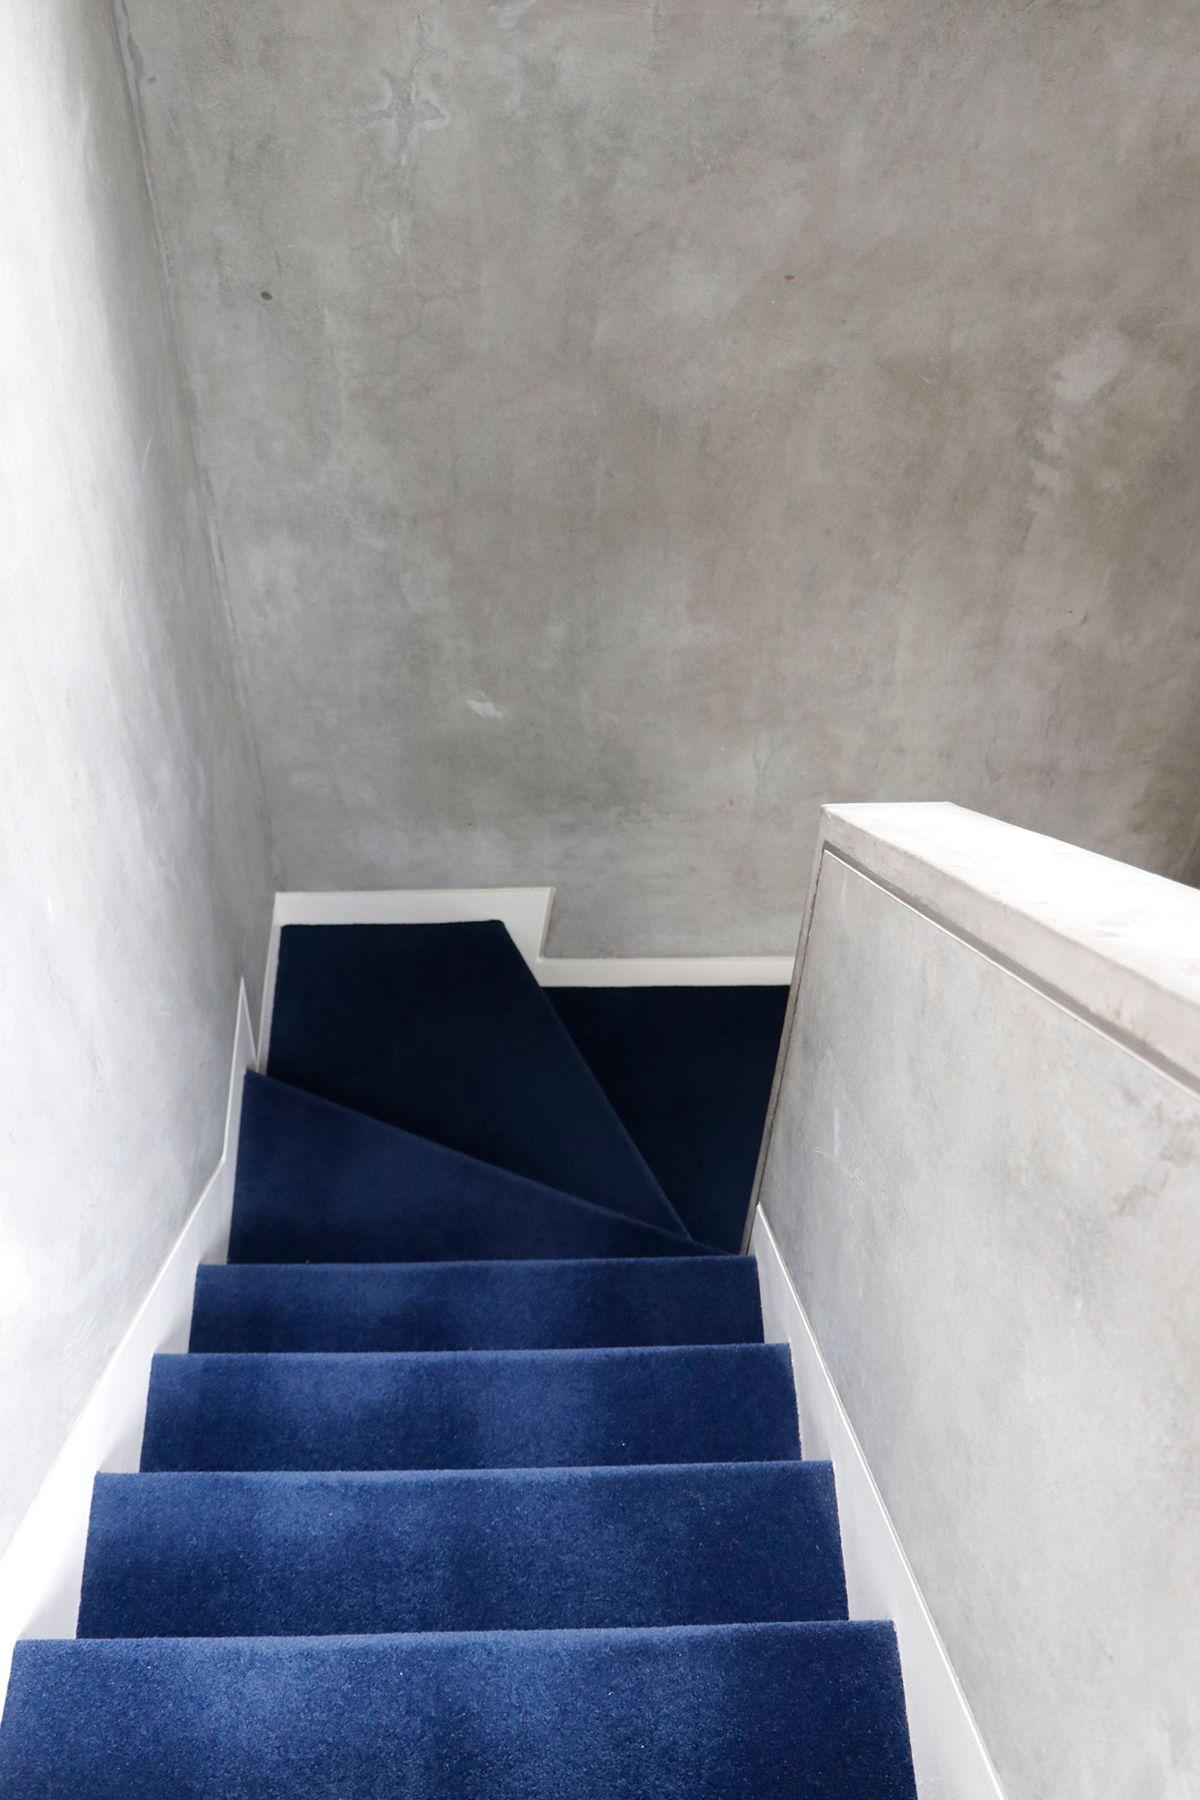 In the concrete/個人宅 (イン ザ コンクリート)カーペットの階段